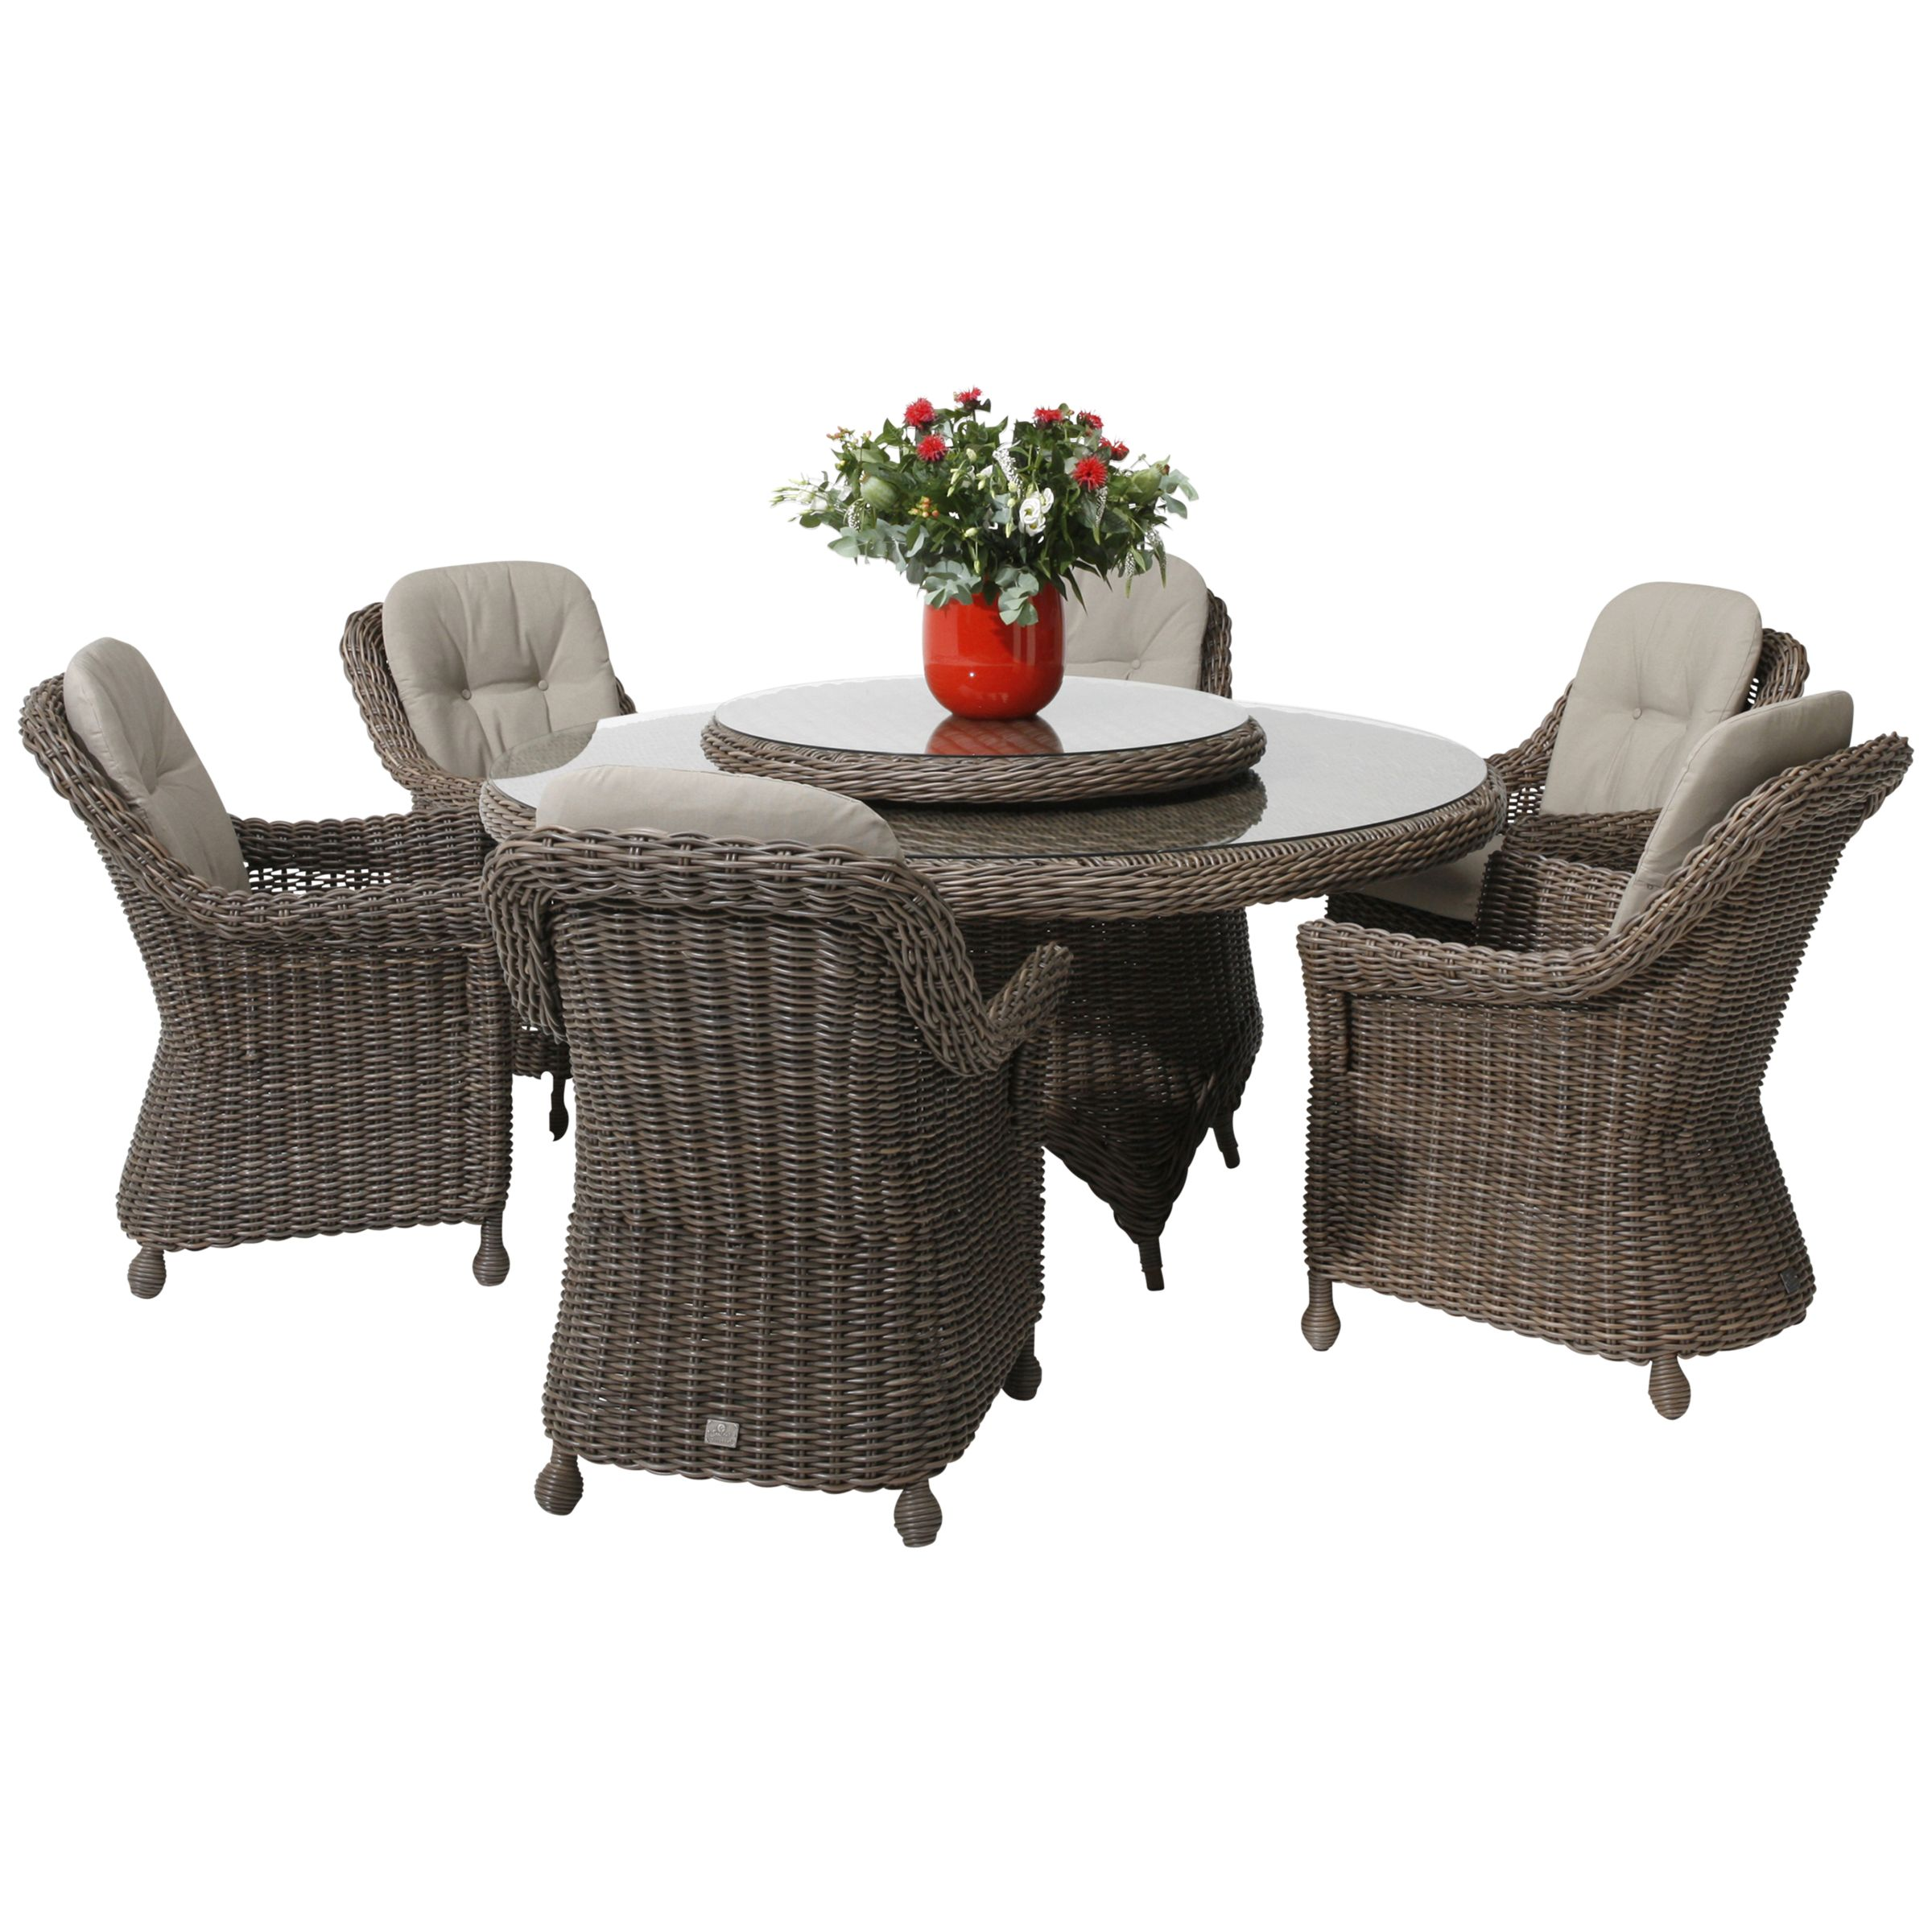 4 Seasons Outdoor Madoera 6-Seater Dining Set